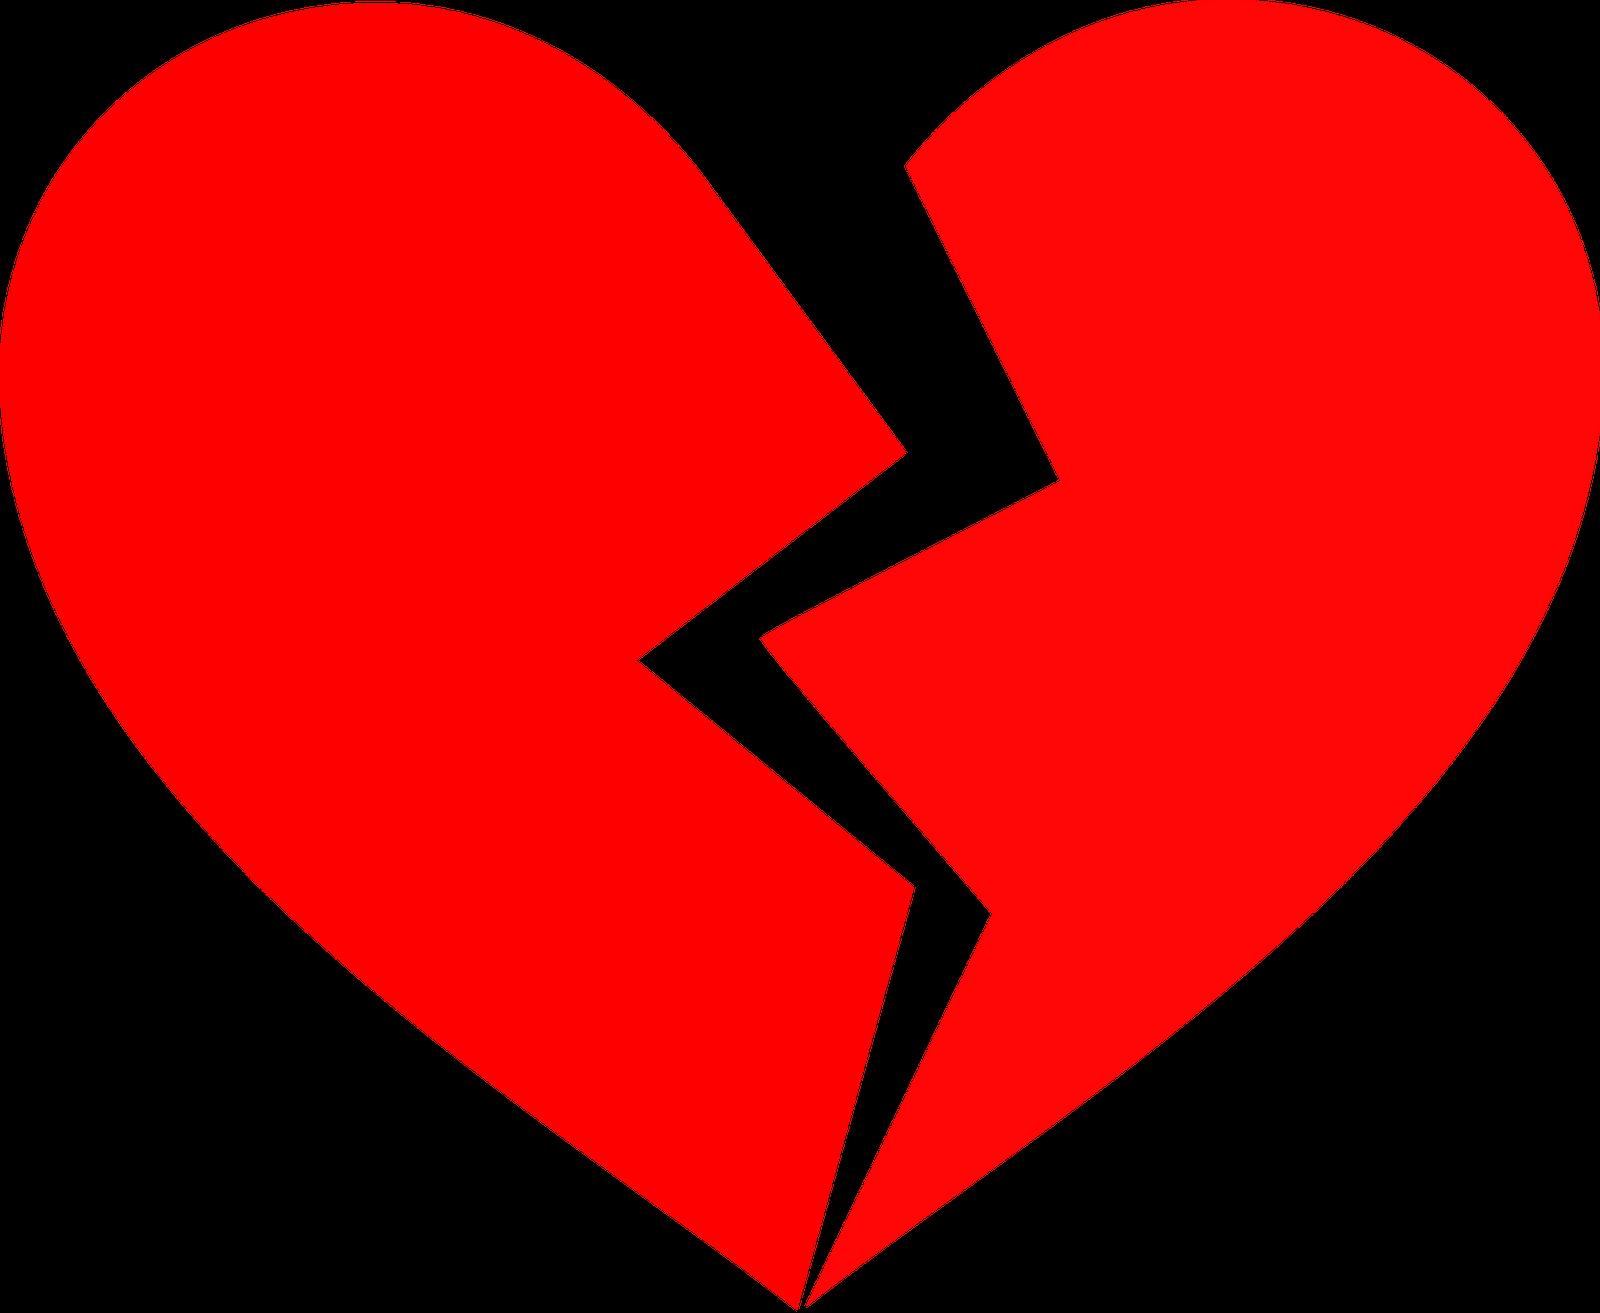 image transparent Broken clipart intact. Heart